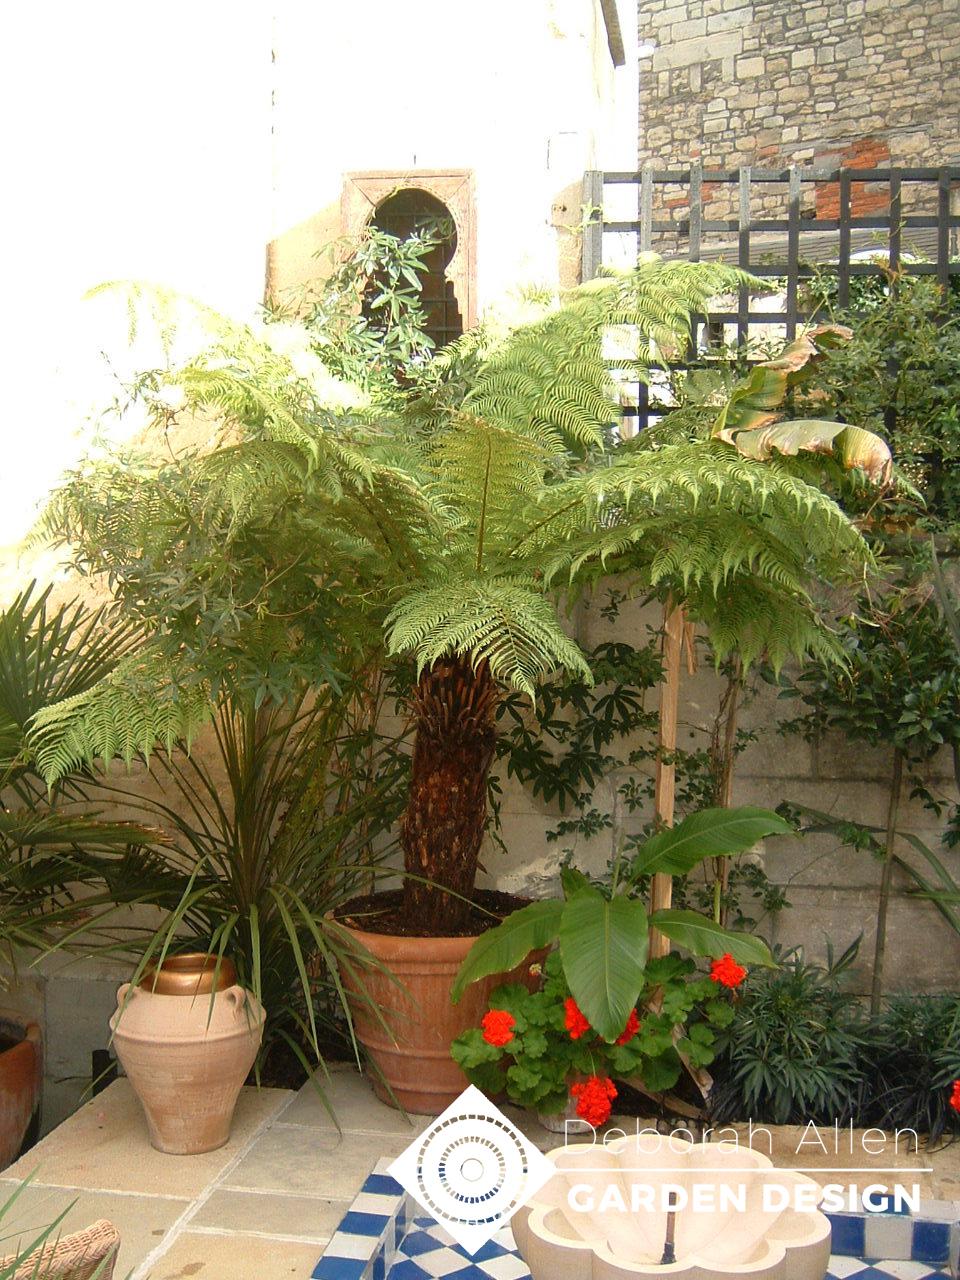 Jane Hull's Moroccan garden 006 copy.jpg